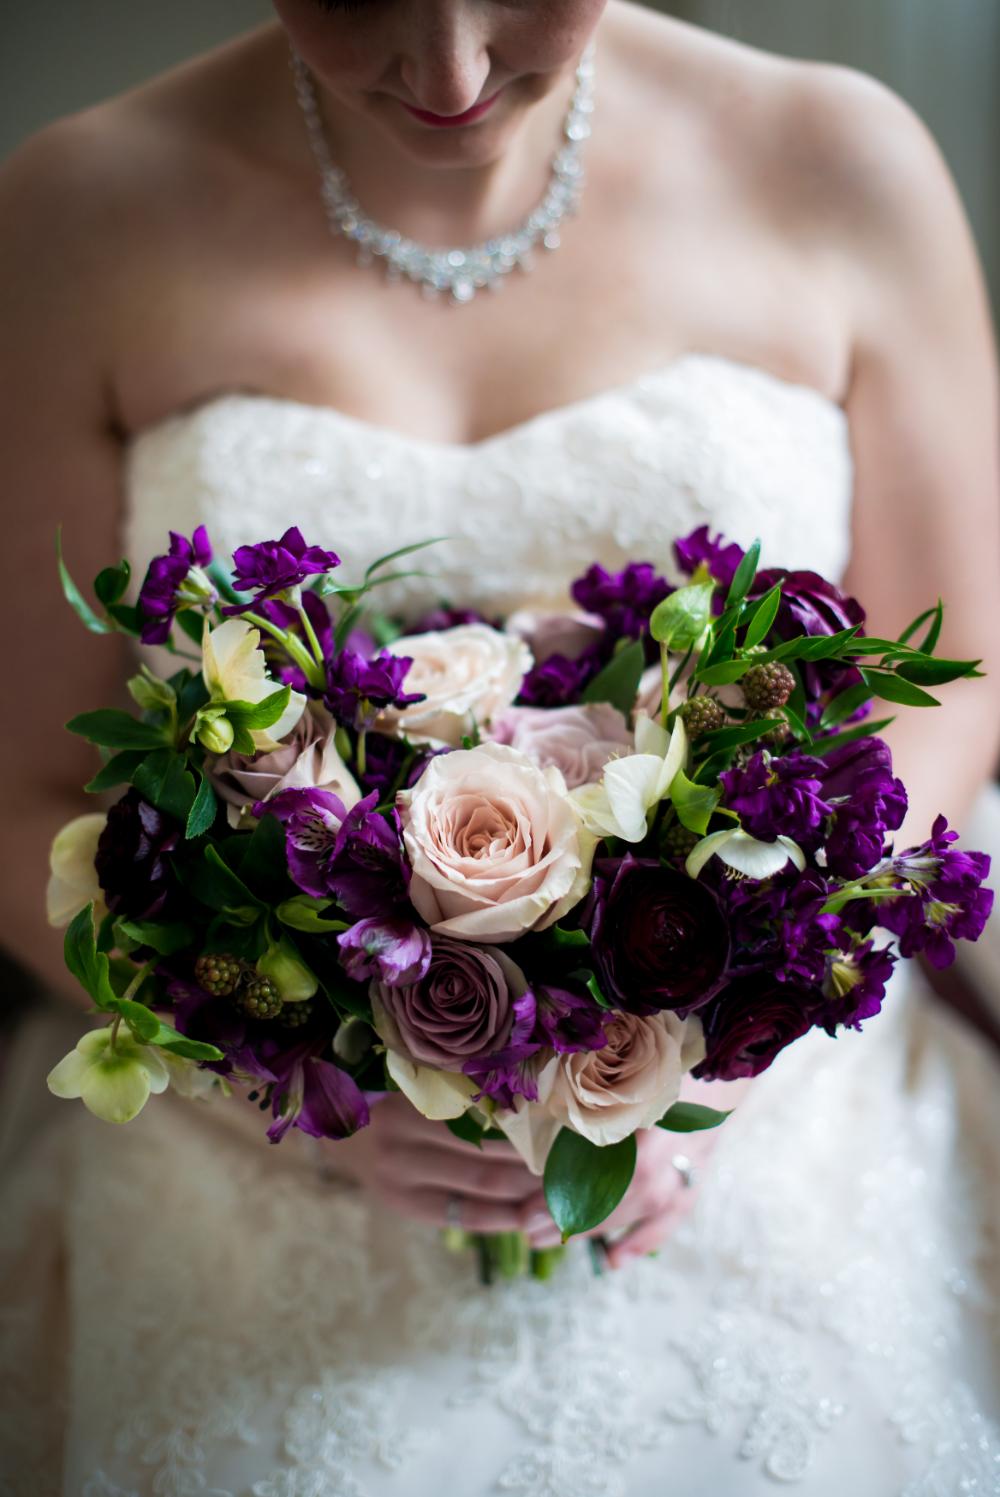 Stone House Creative - Wedding Florist in Winnipeg